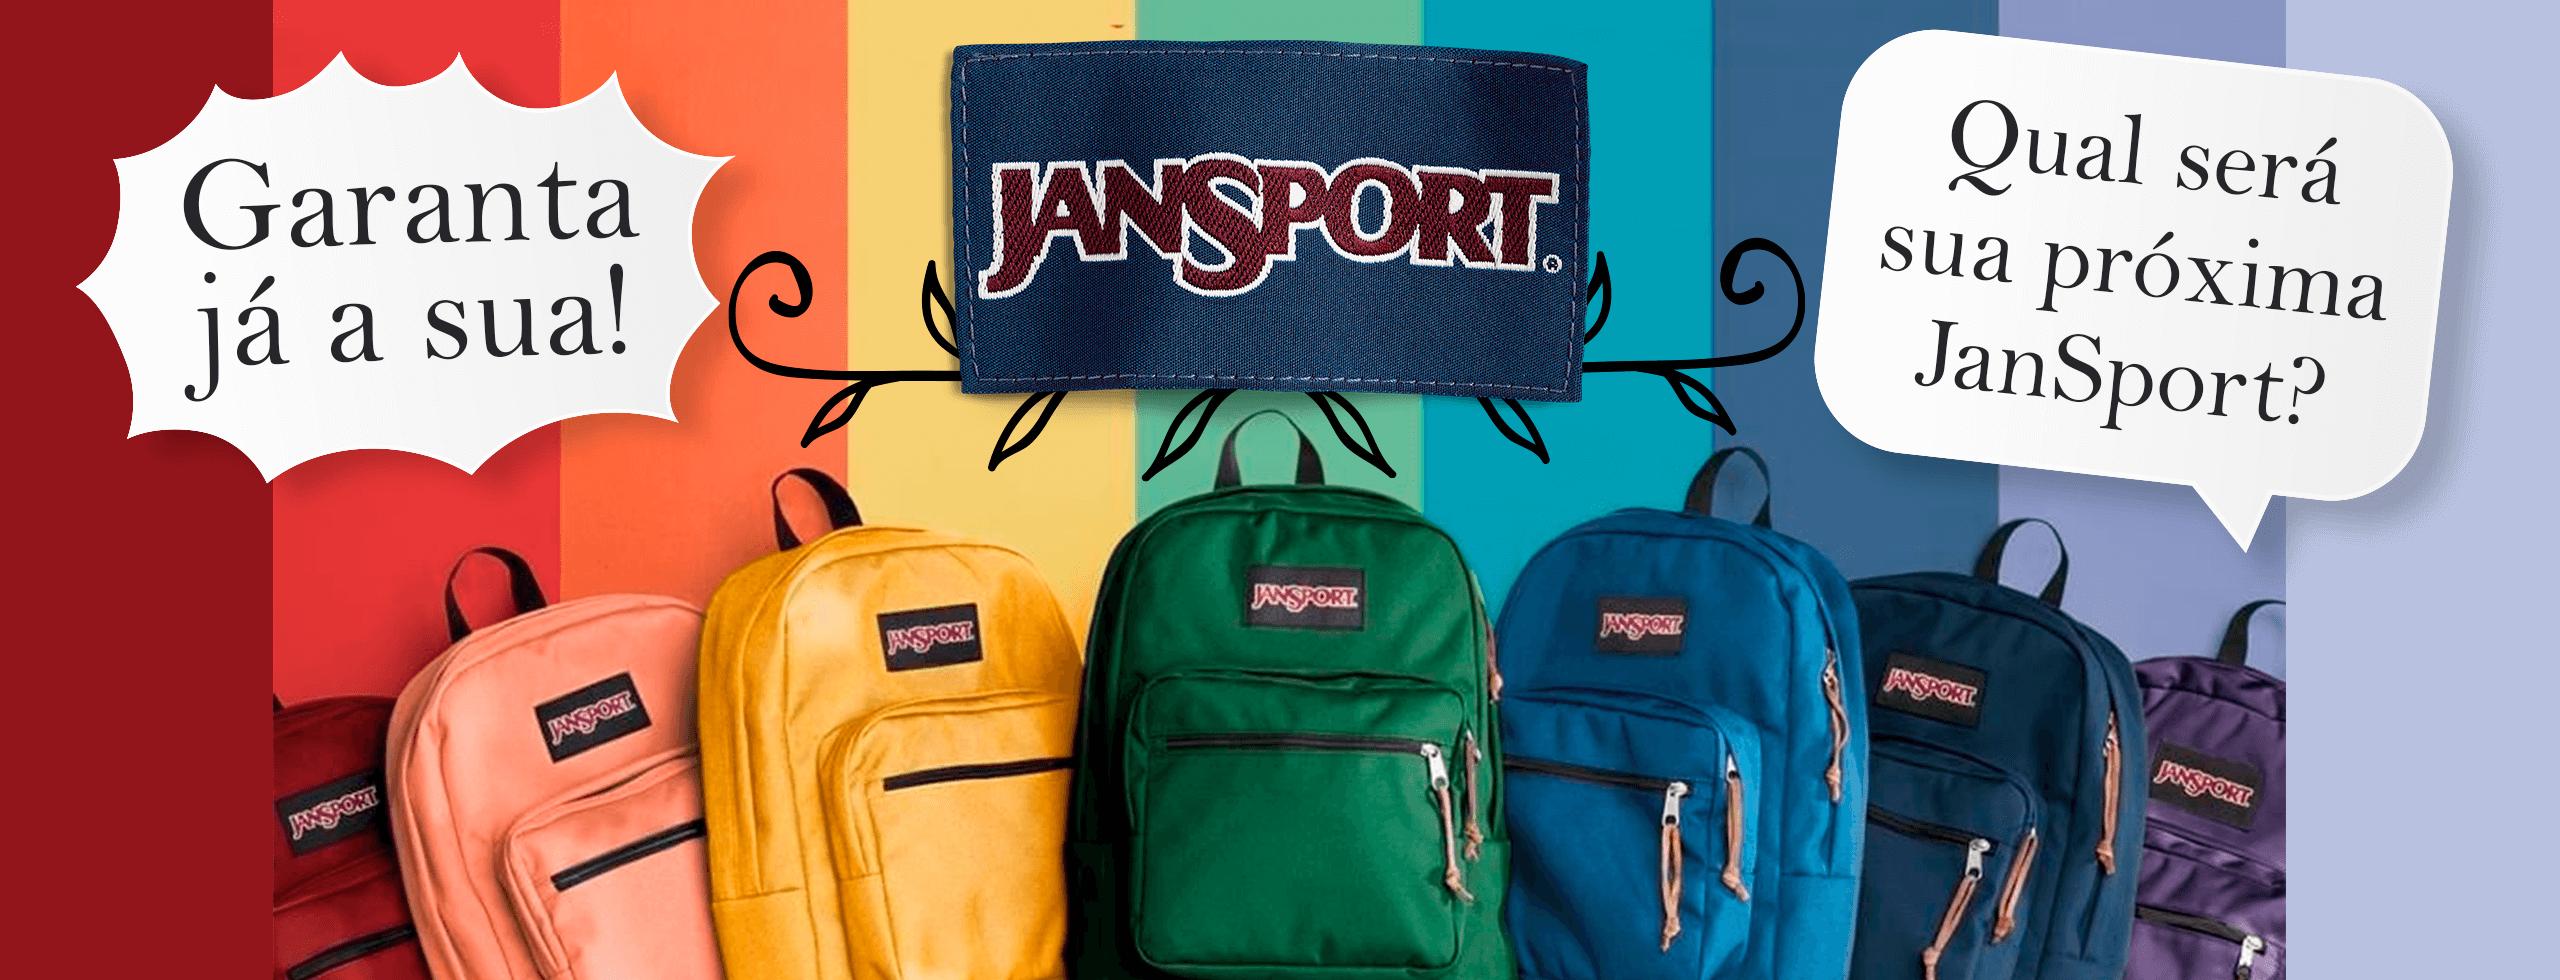 JanSport Banner 2860x980 (1)